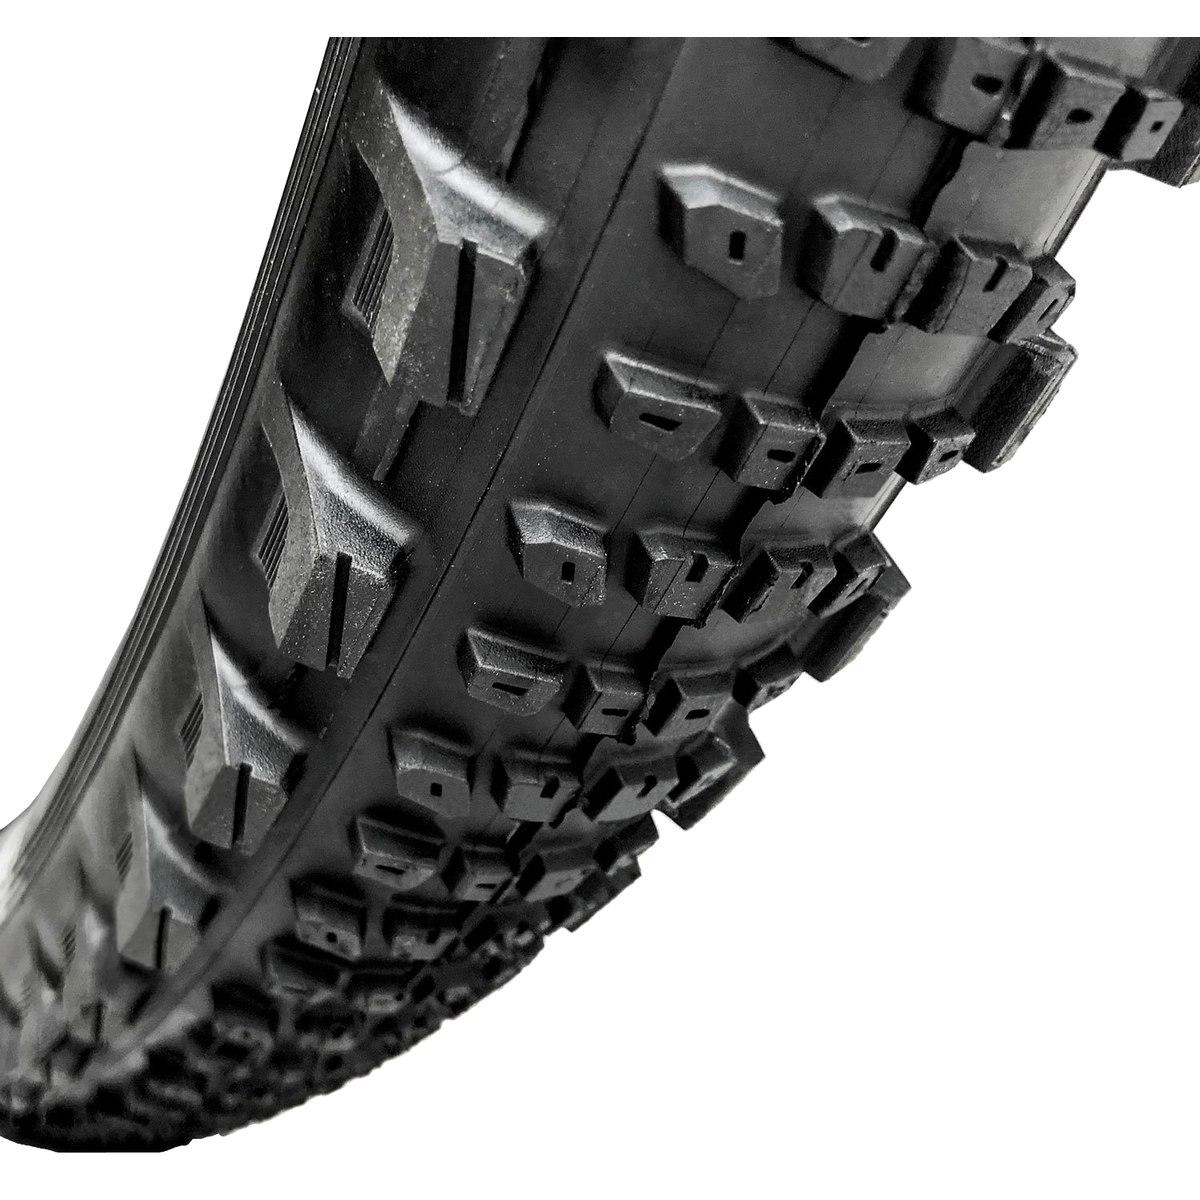 e*thirteen LG1 DH Plus Semi-Slick MTB Folding Tire - 27.5x2.35 Inches